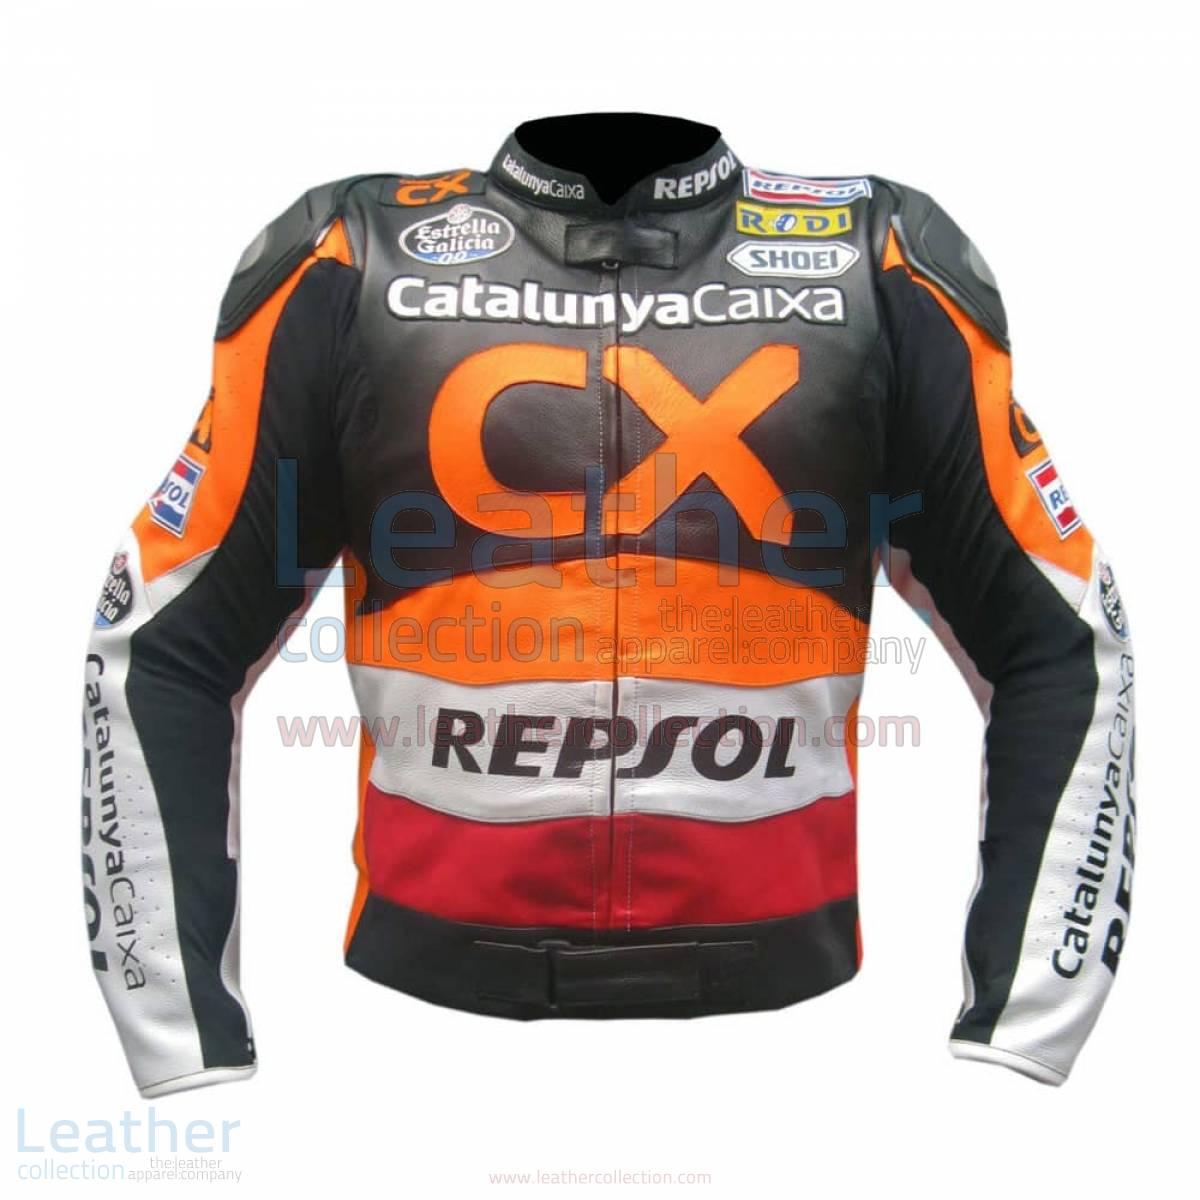 Repsol CX Leather Race Jacket –  Jacket